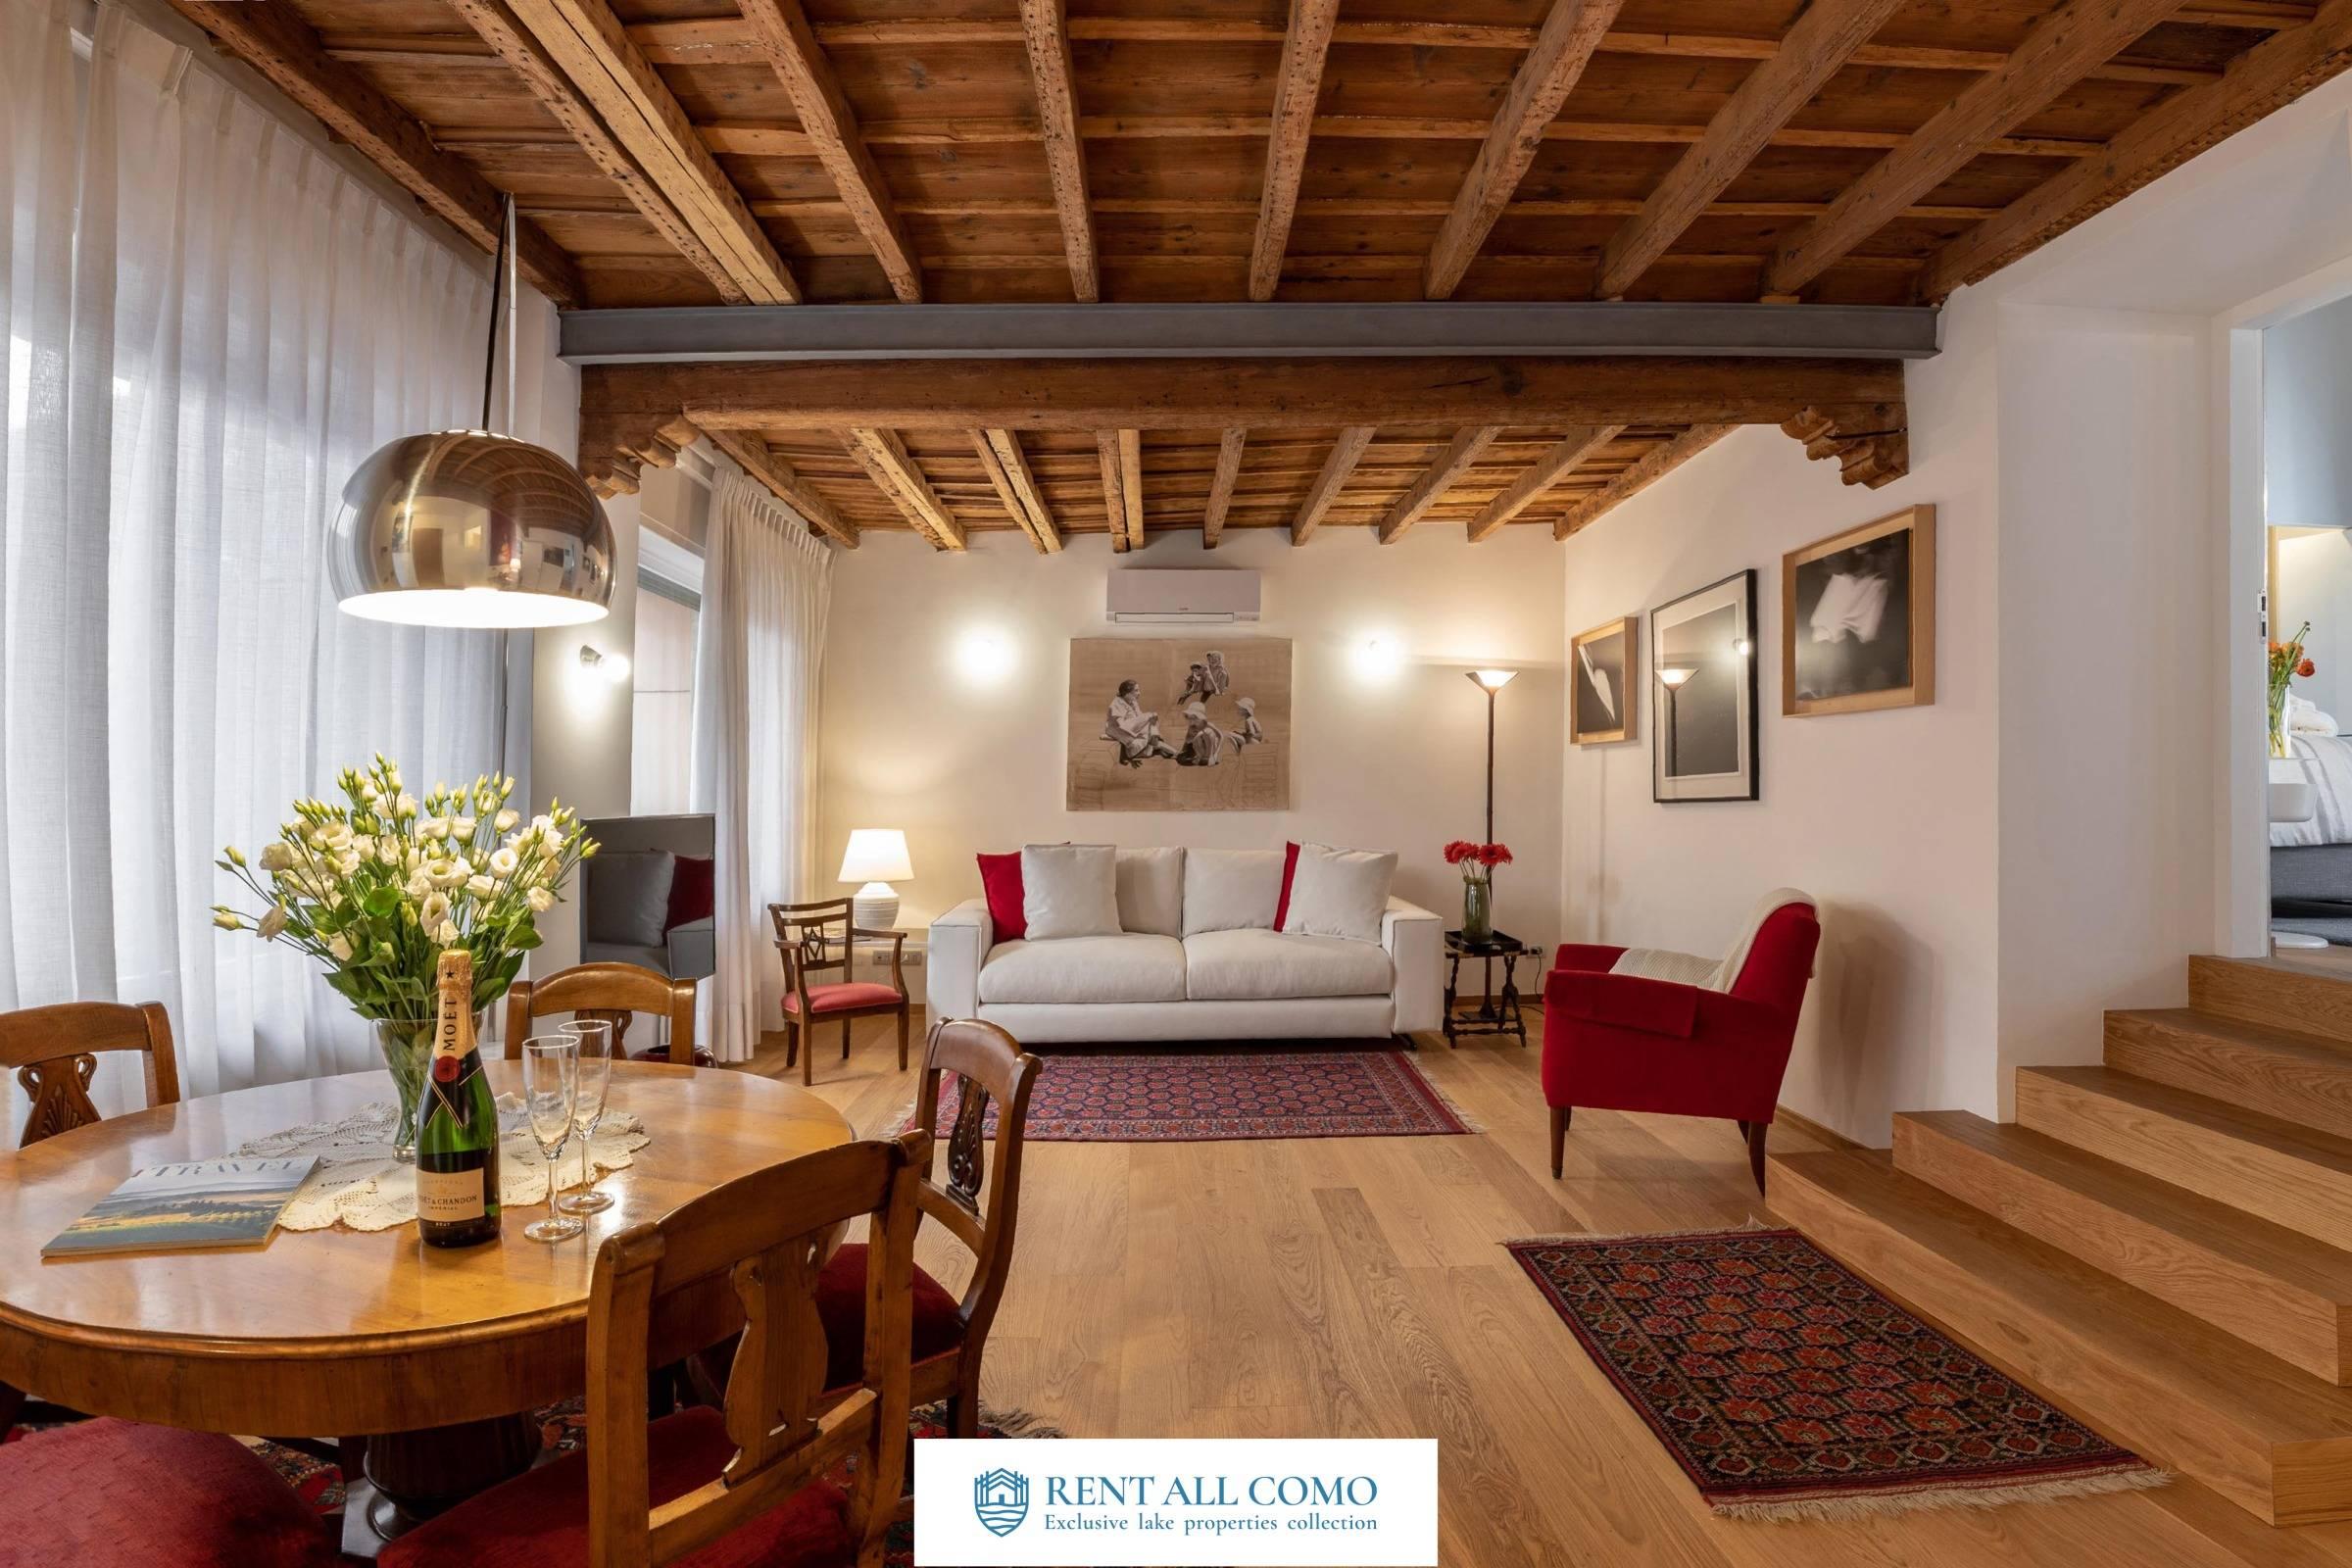 rent-all-como_apartment-boutique